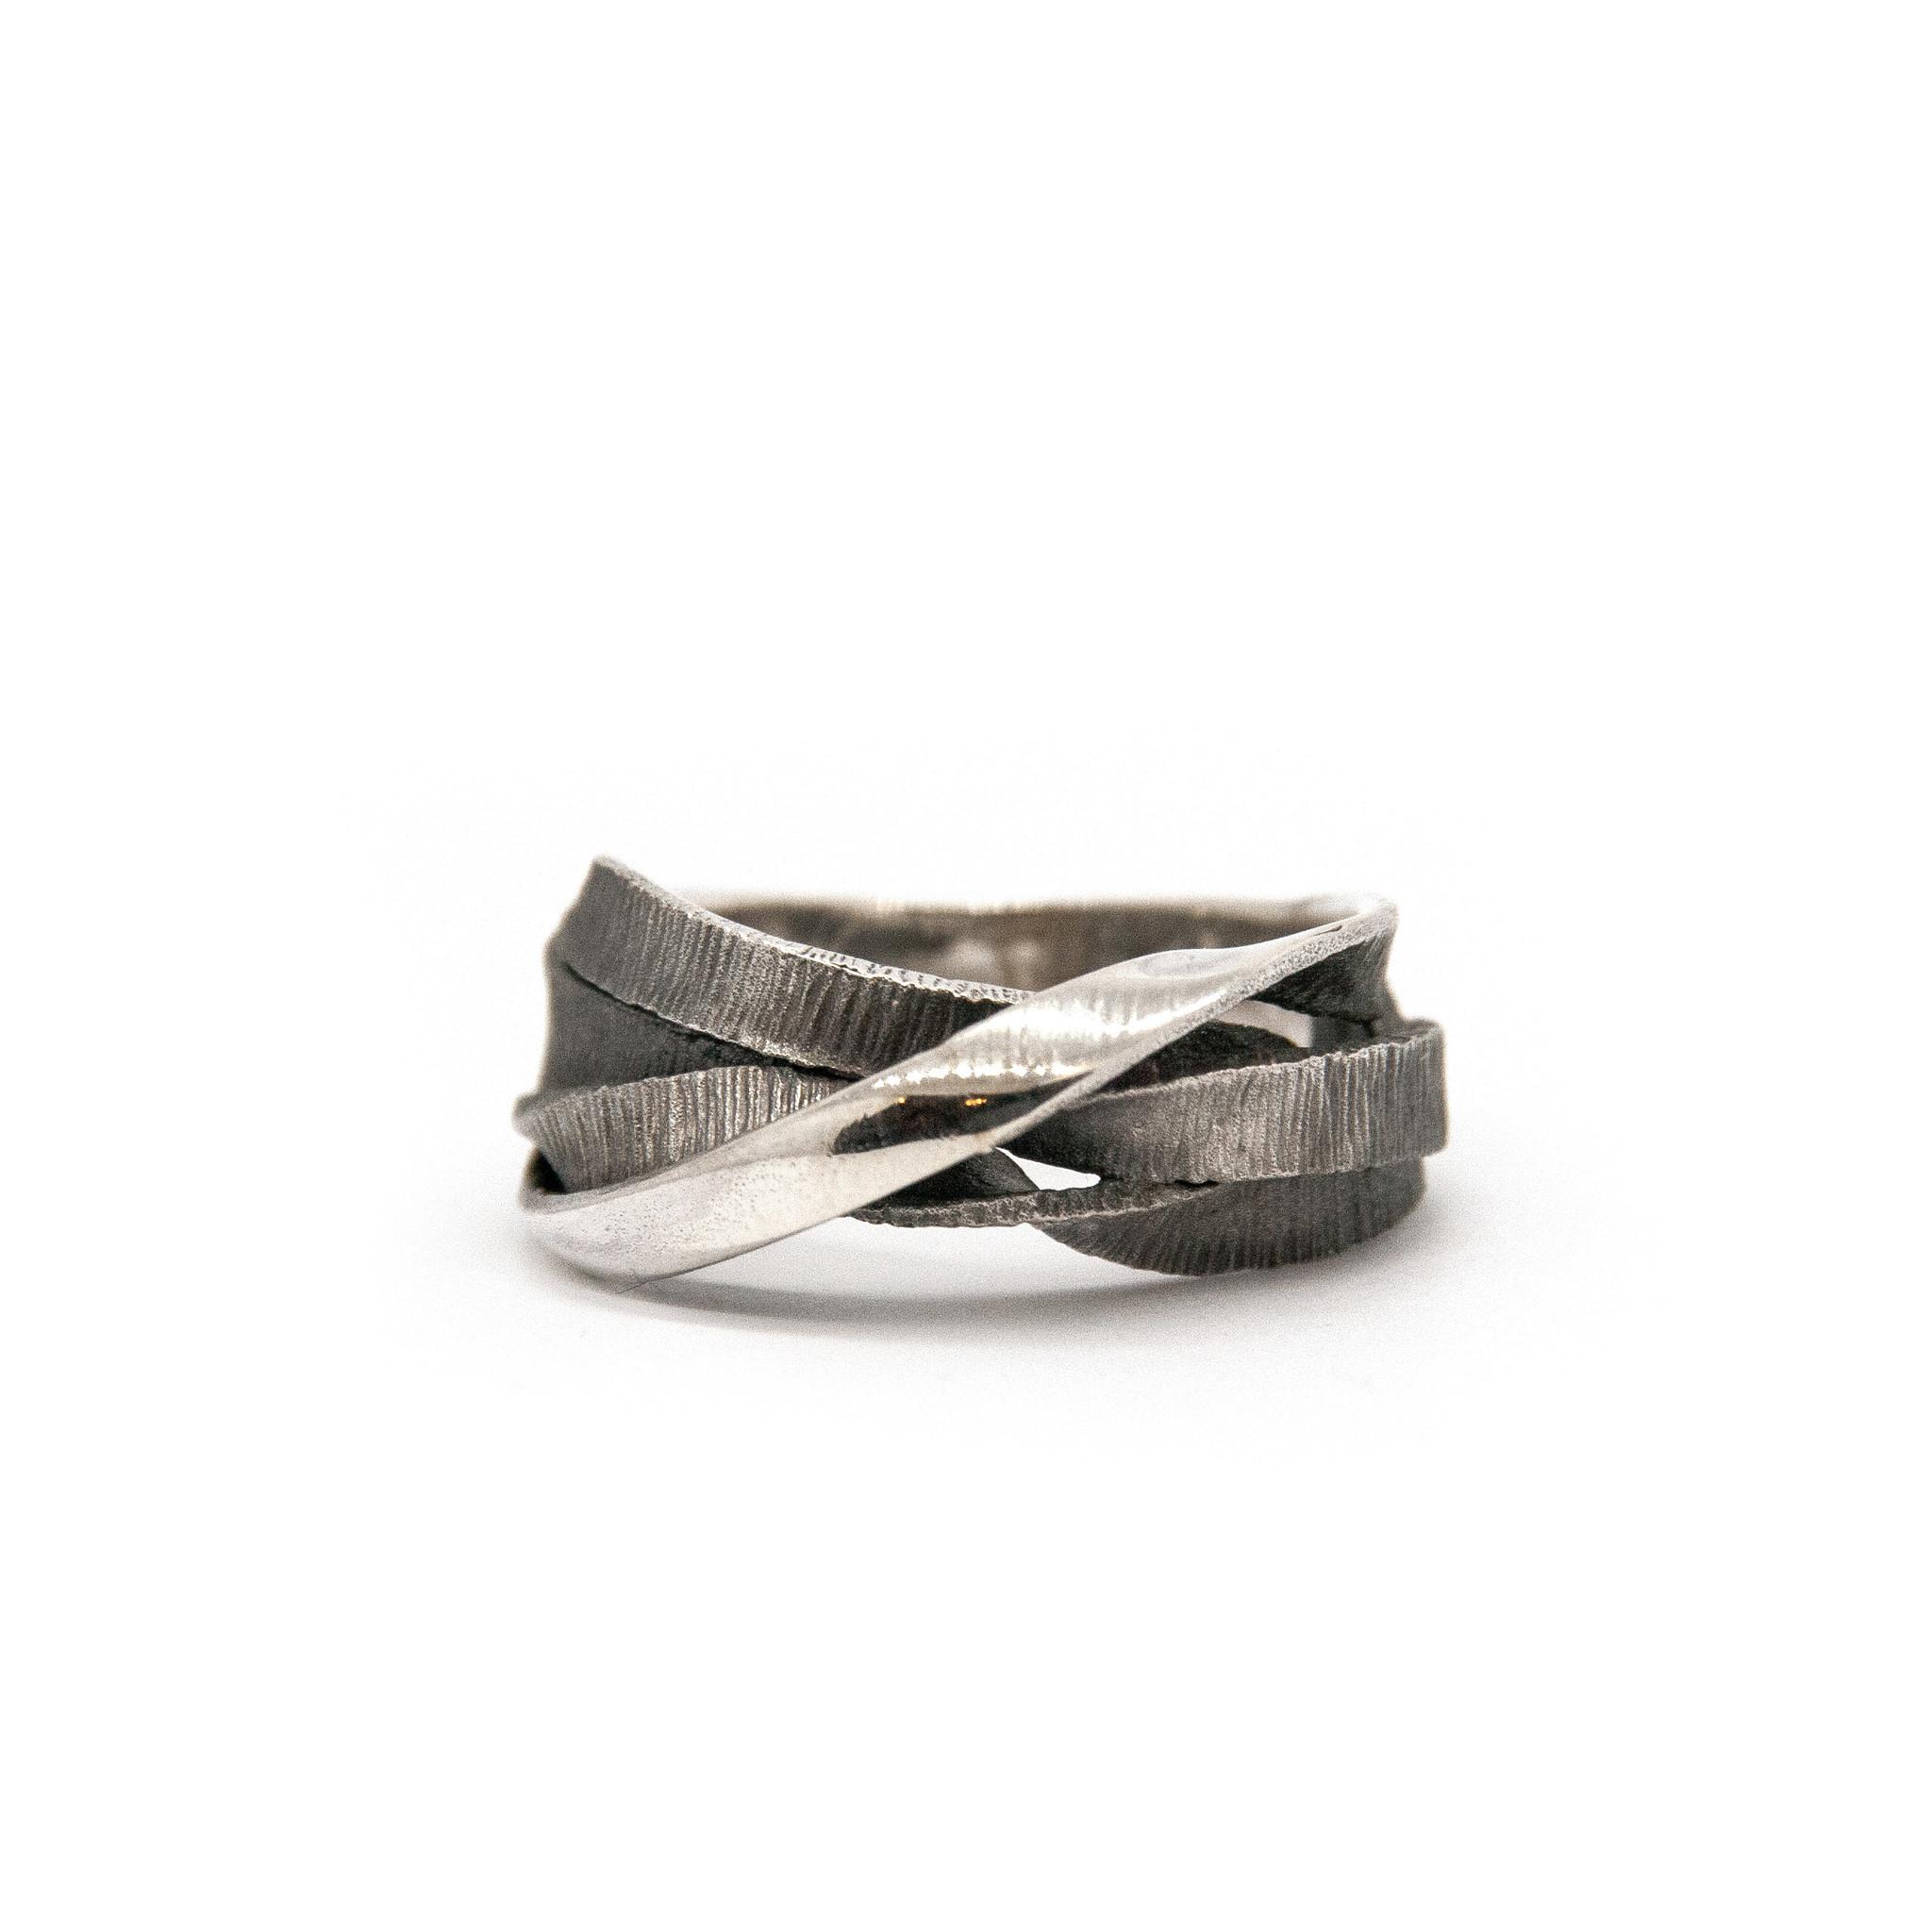 Moebius 3+1 ring-1